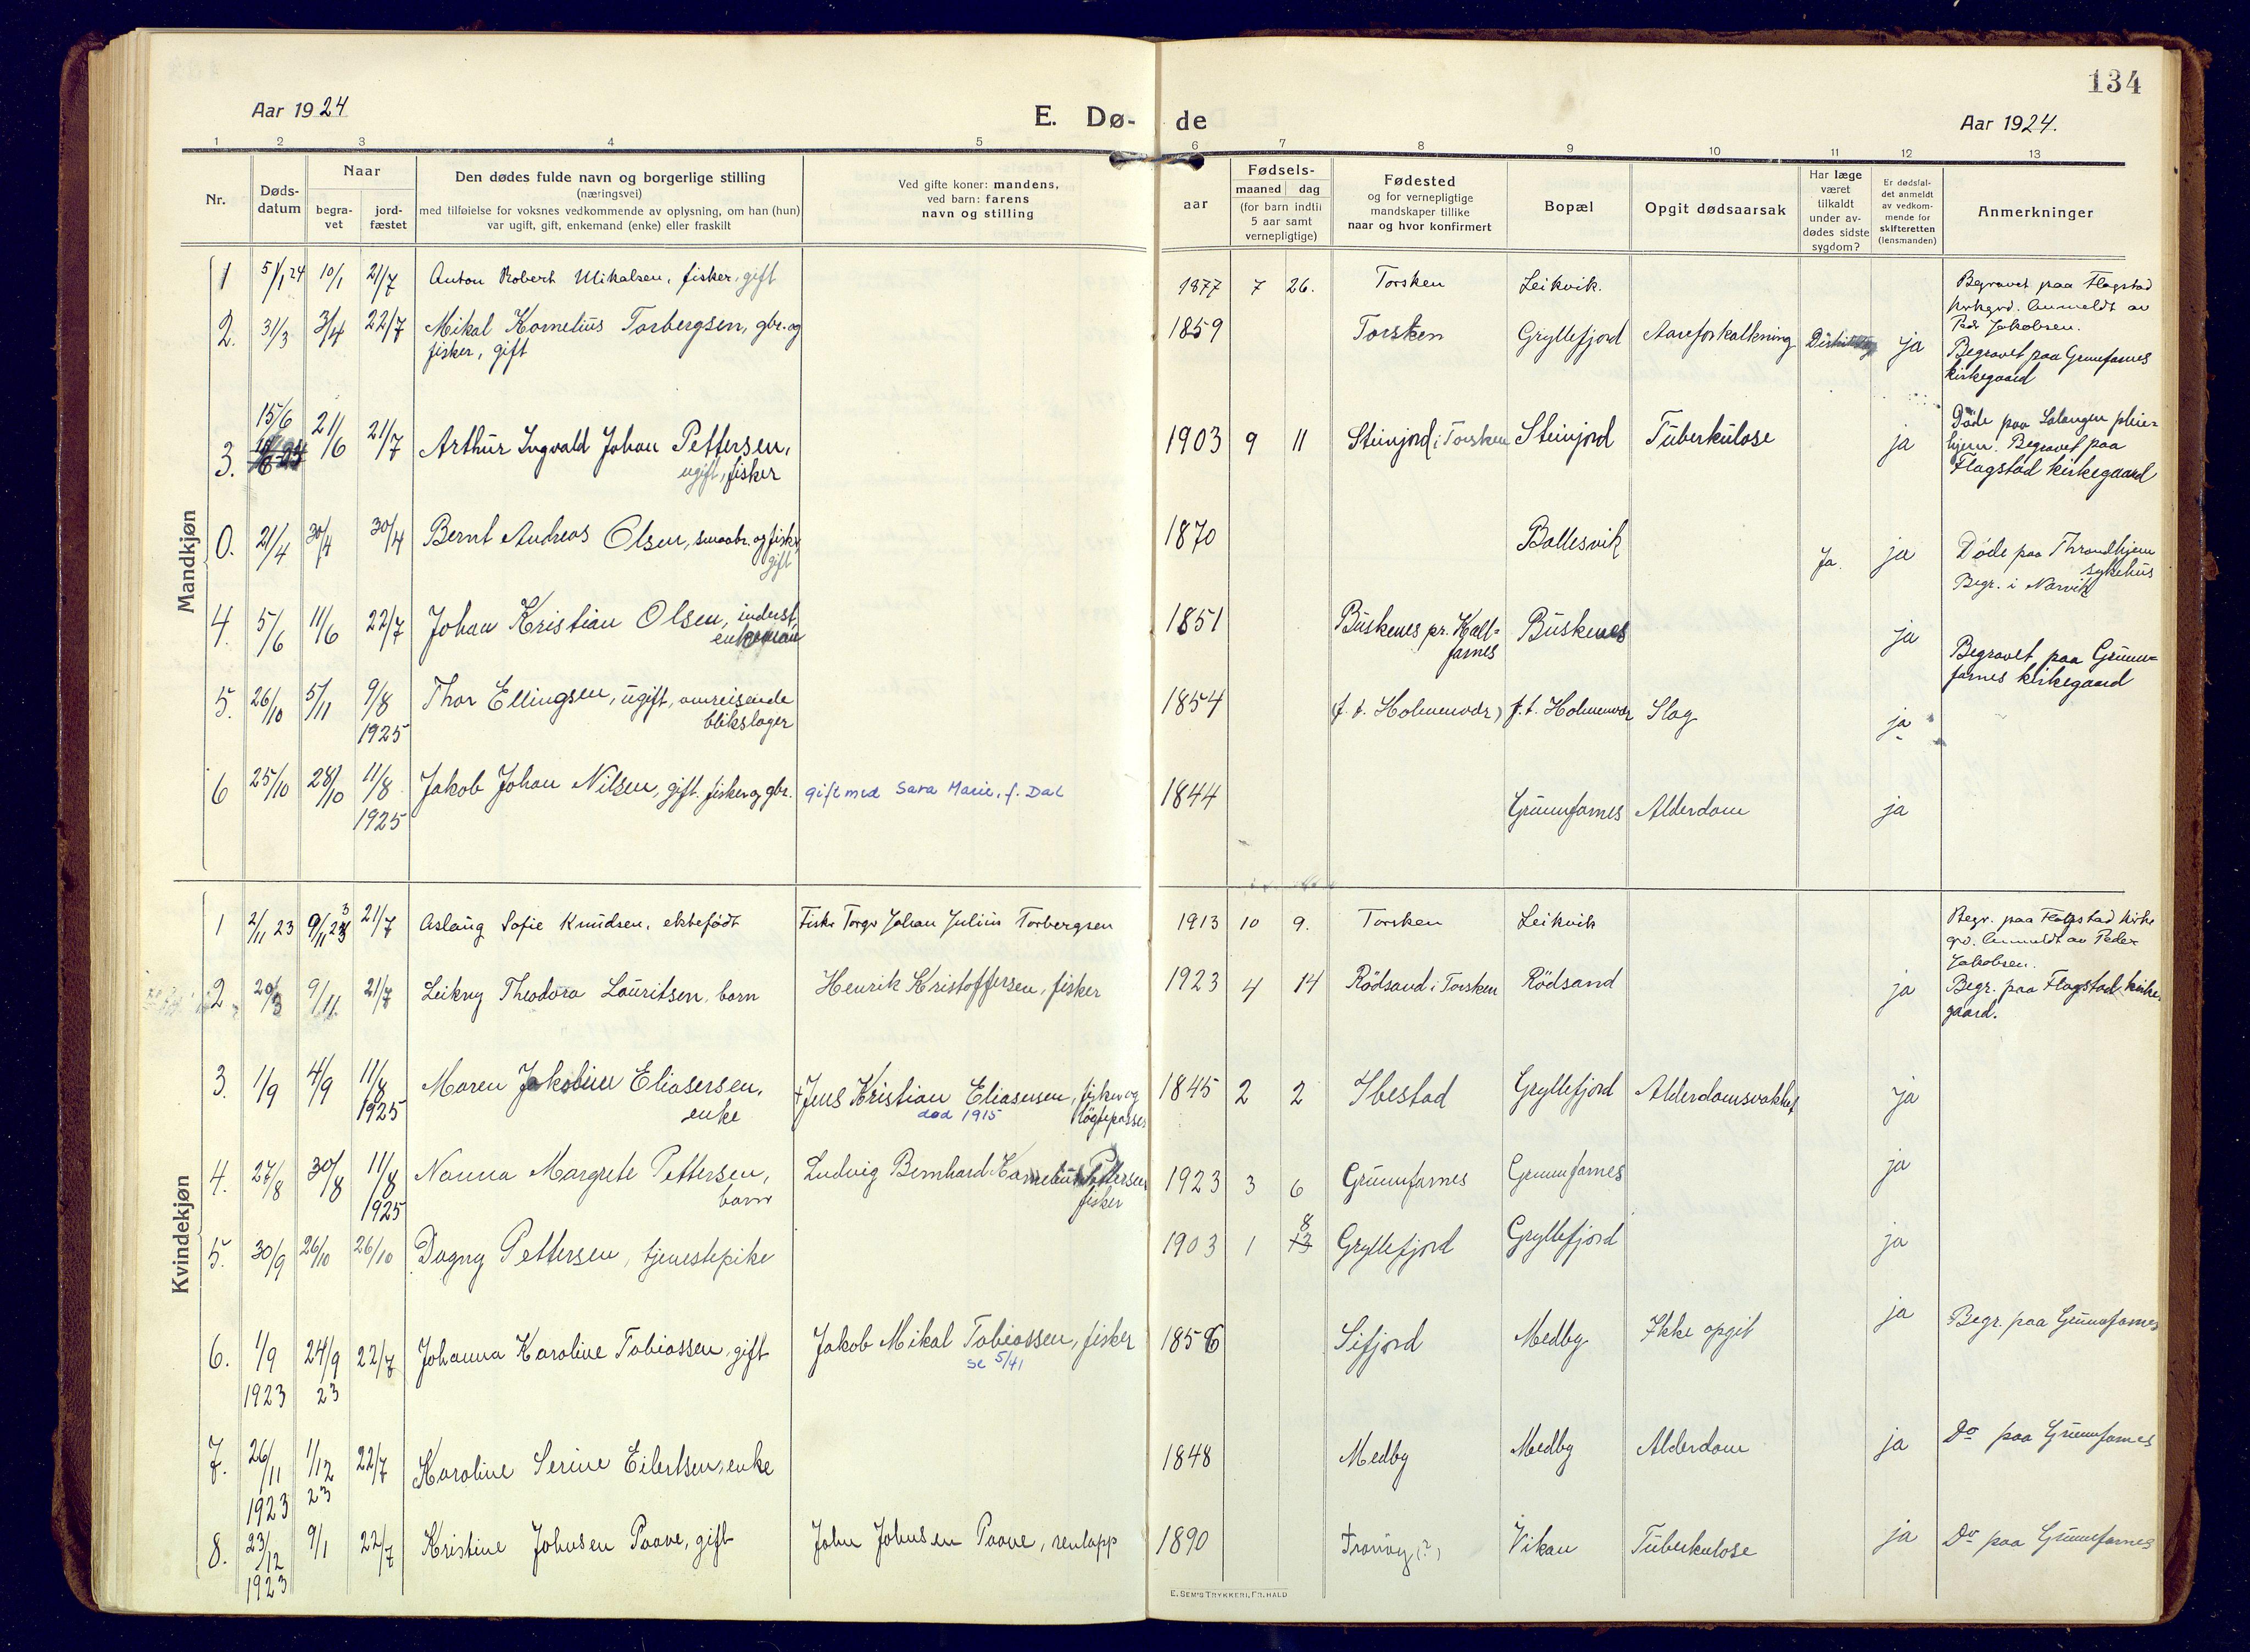 SATØ, Mefjord/Berg sokneprestkontor, G/Ga/Gaa: Ministerialbok nr. 10, 1916-1928, s. 134